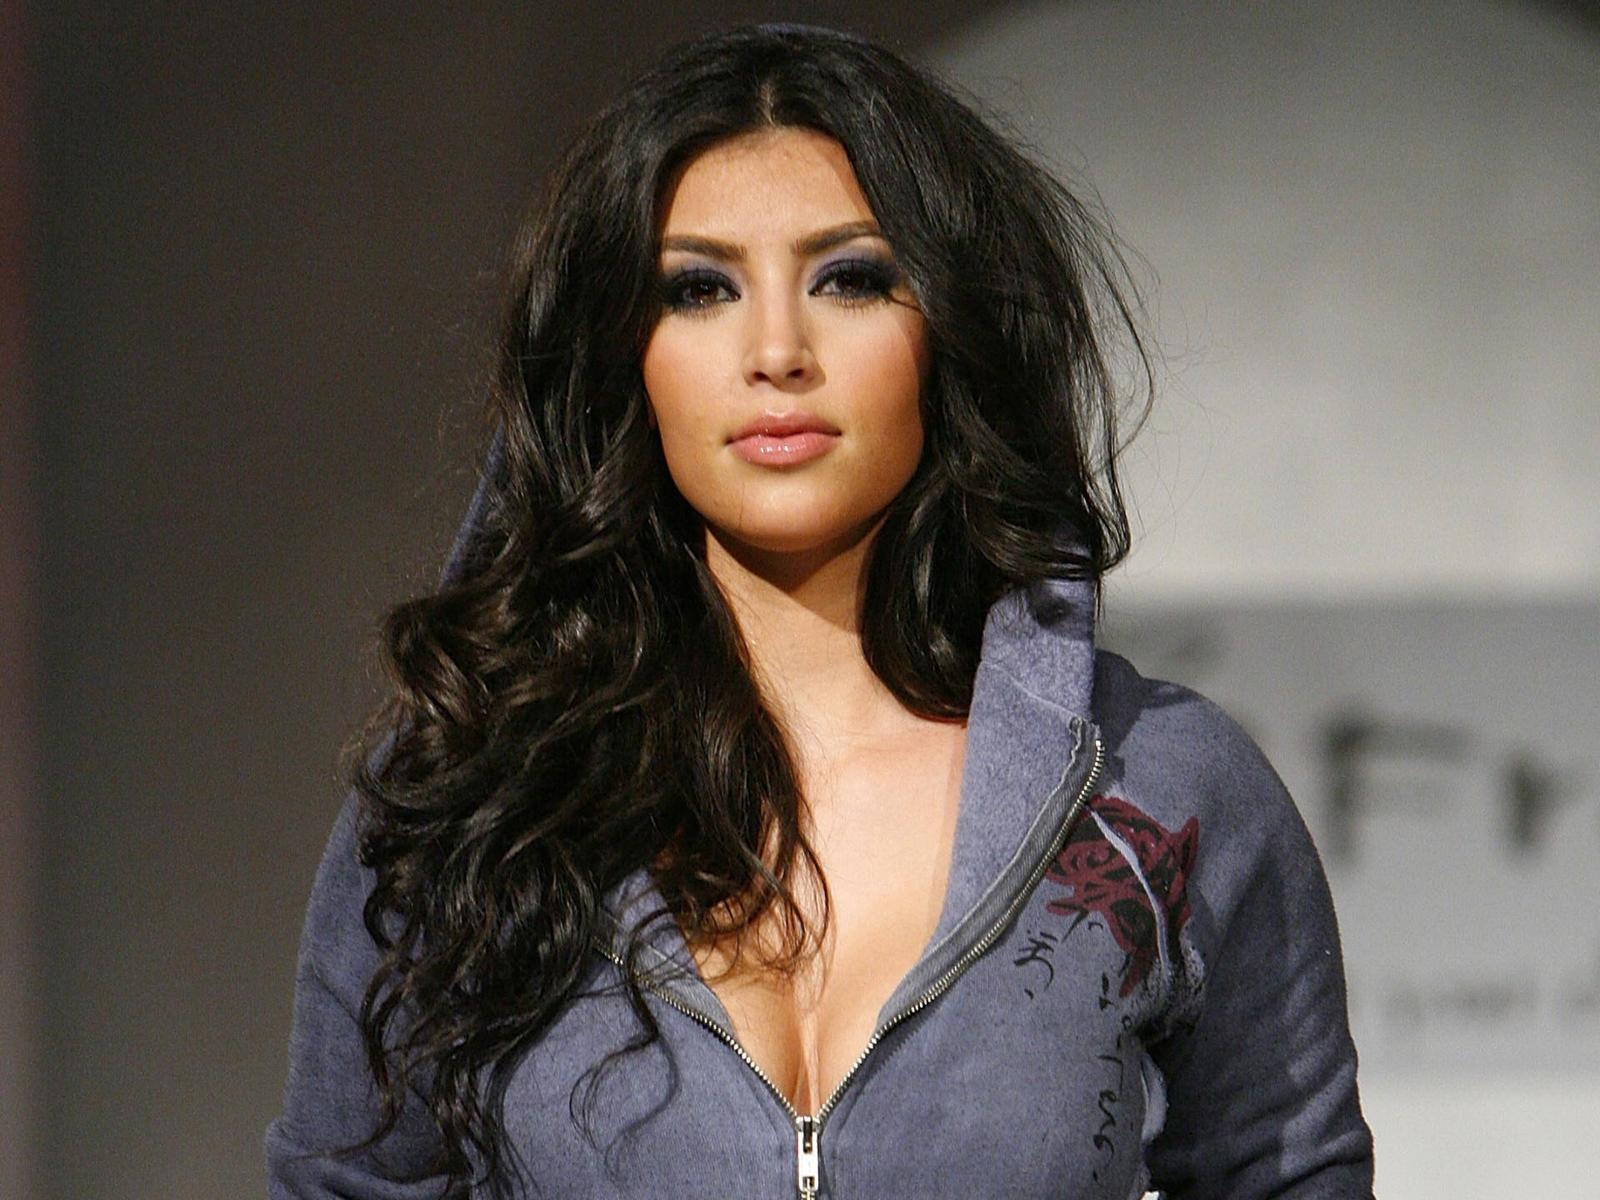 Kim kardashian achtergronden kim kardashian wallpapers afbeeldingen 1600x1200